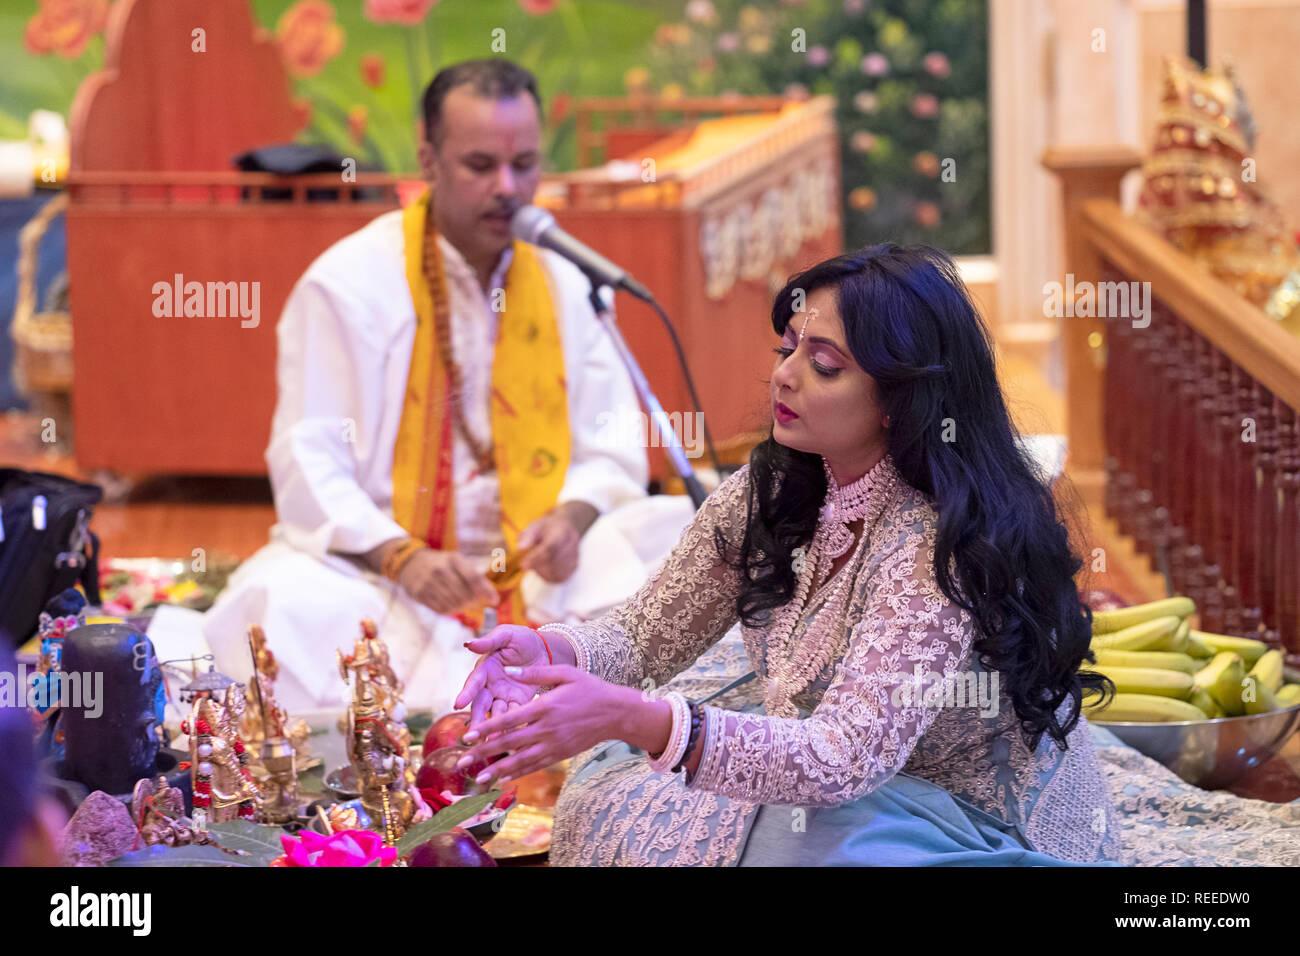 A beautiful devout Hindu worshipper celebrates her birthday by